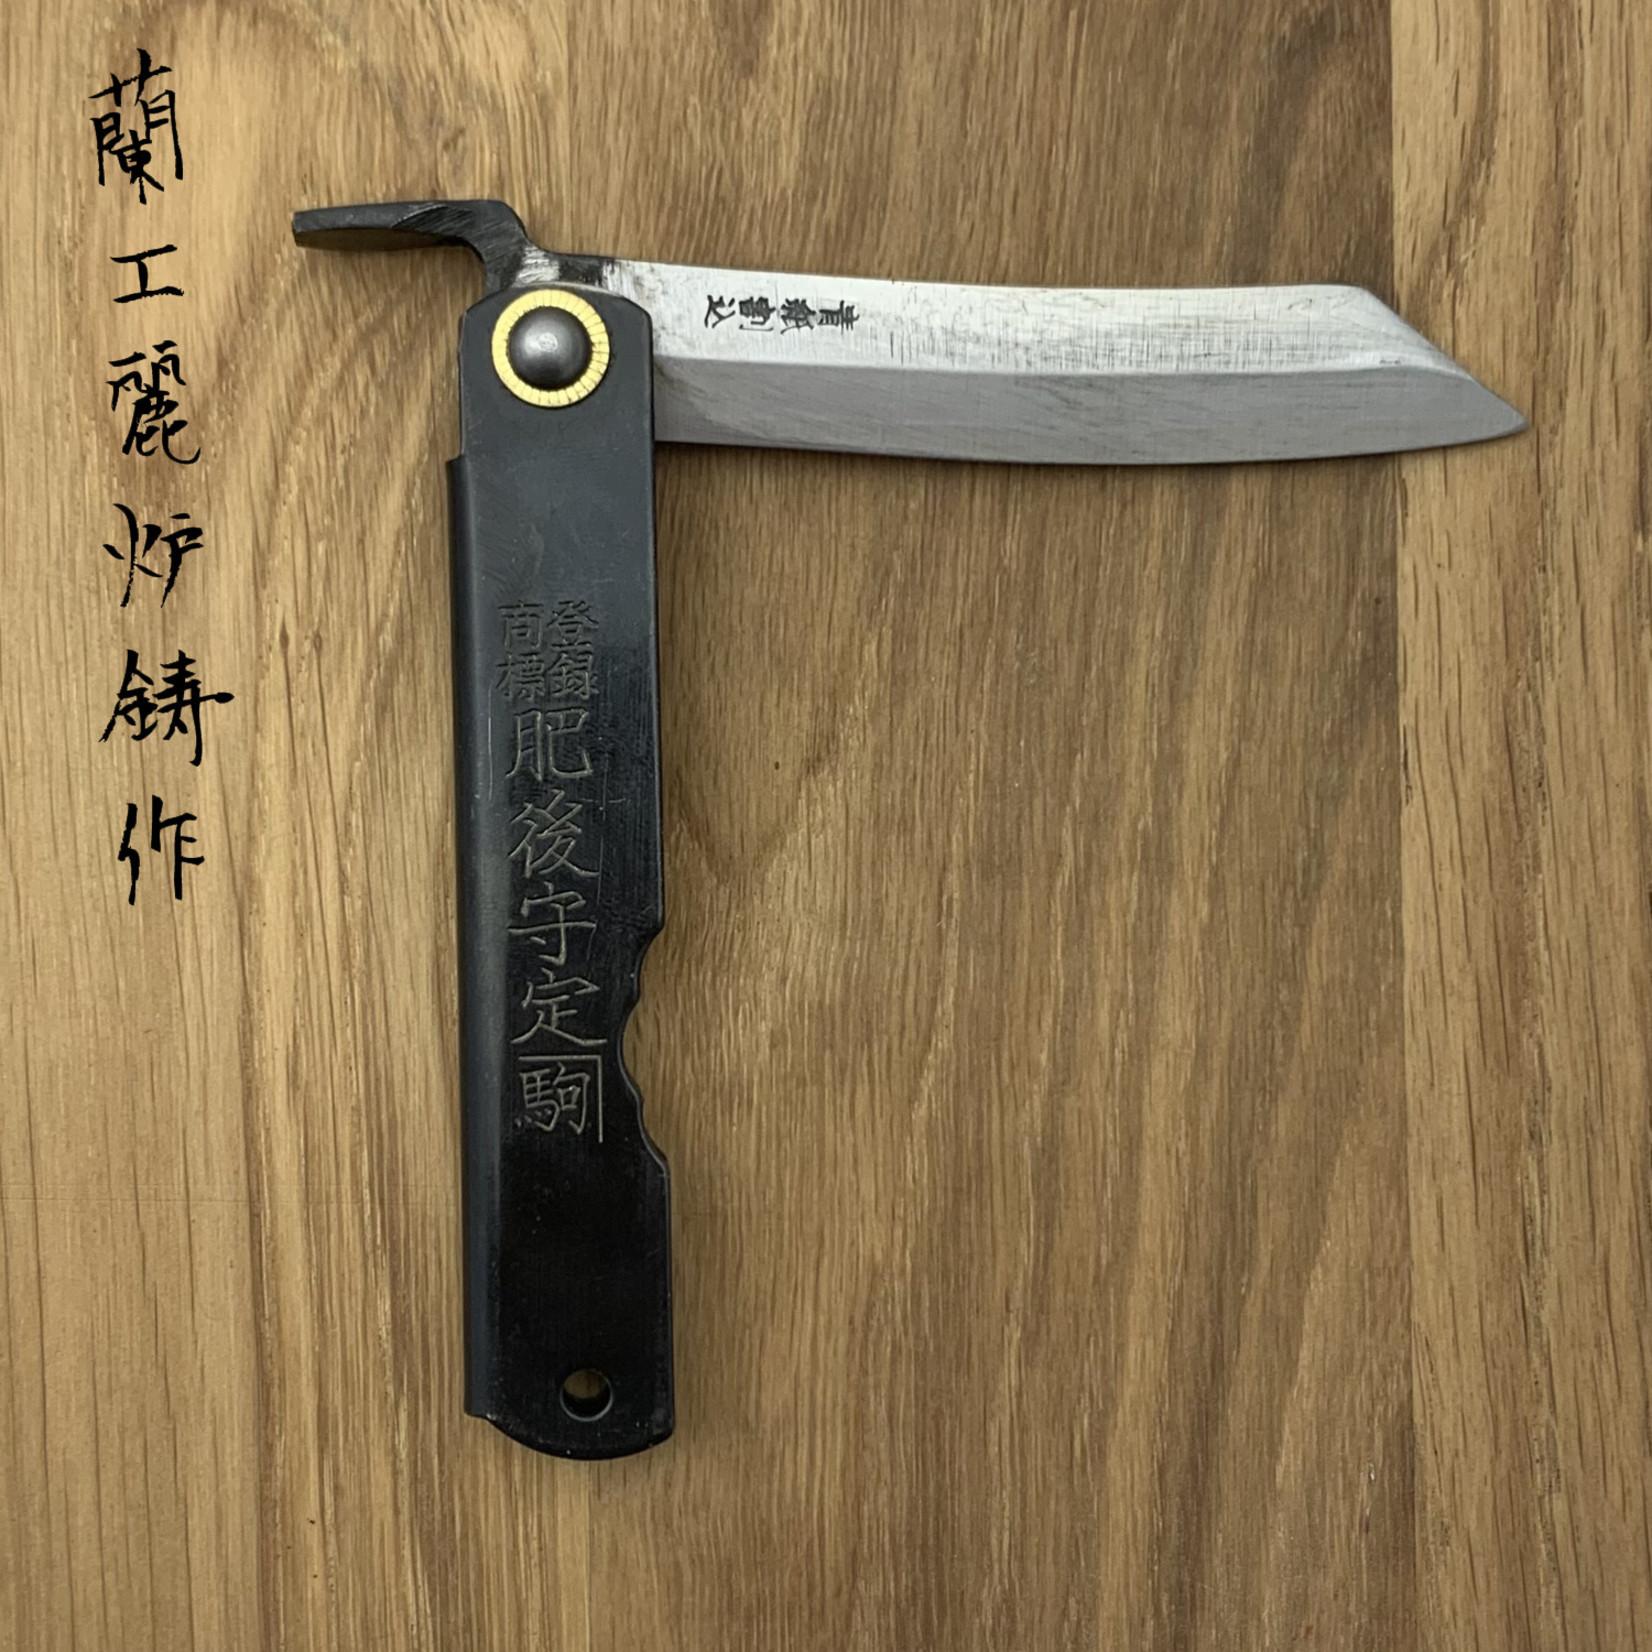 Higonokami Blue steel core 75 mm Black 14GD